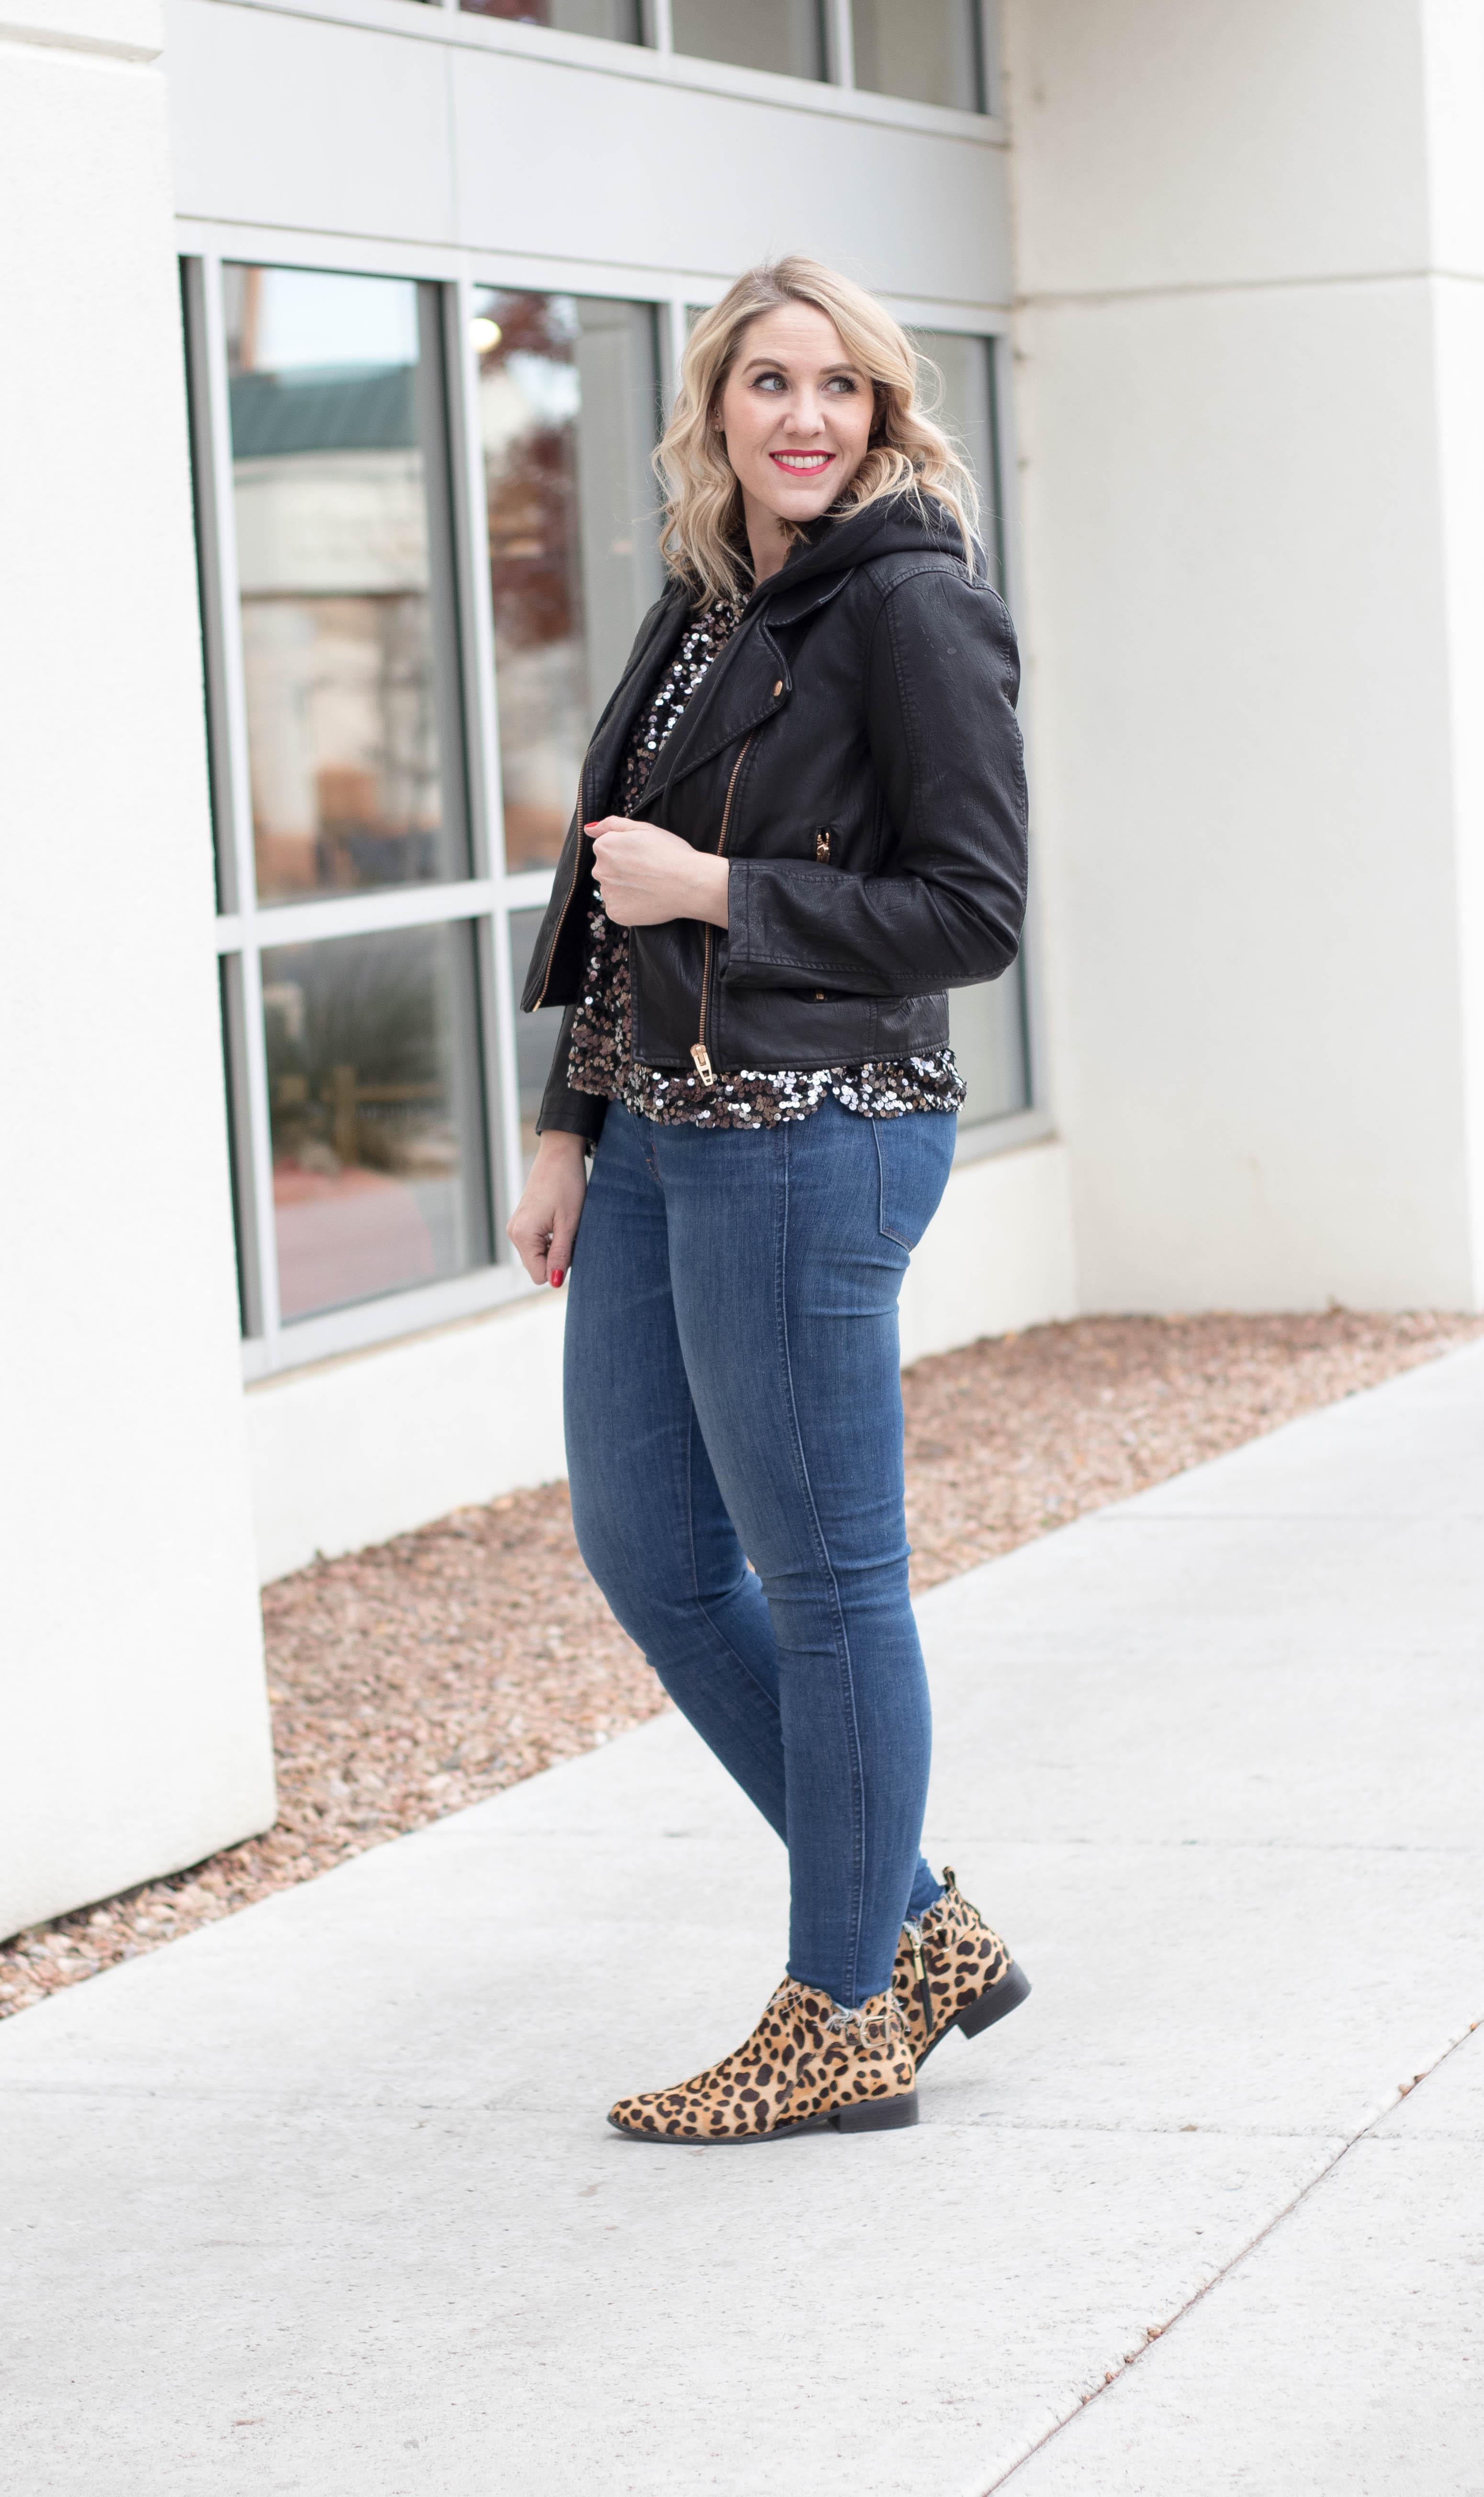 how to wear leopard boots #leopardboots #blanknycleather #winterstyle